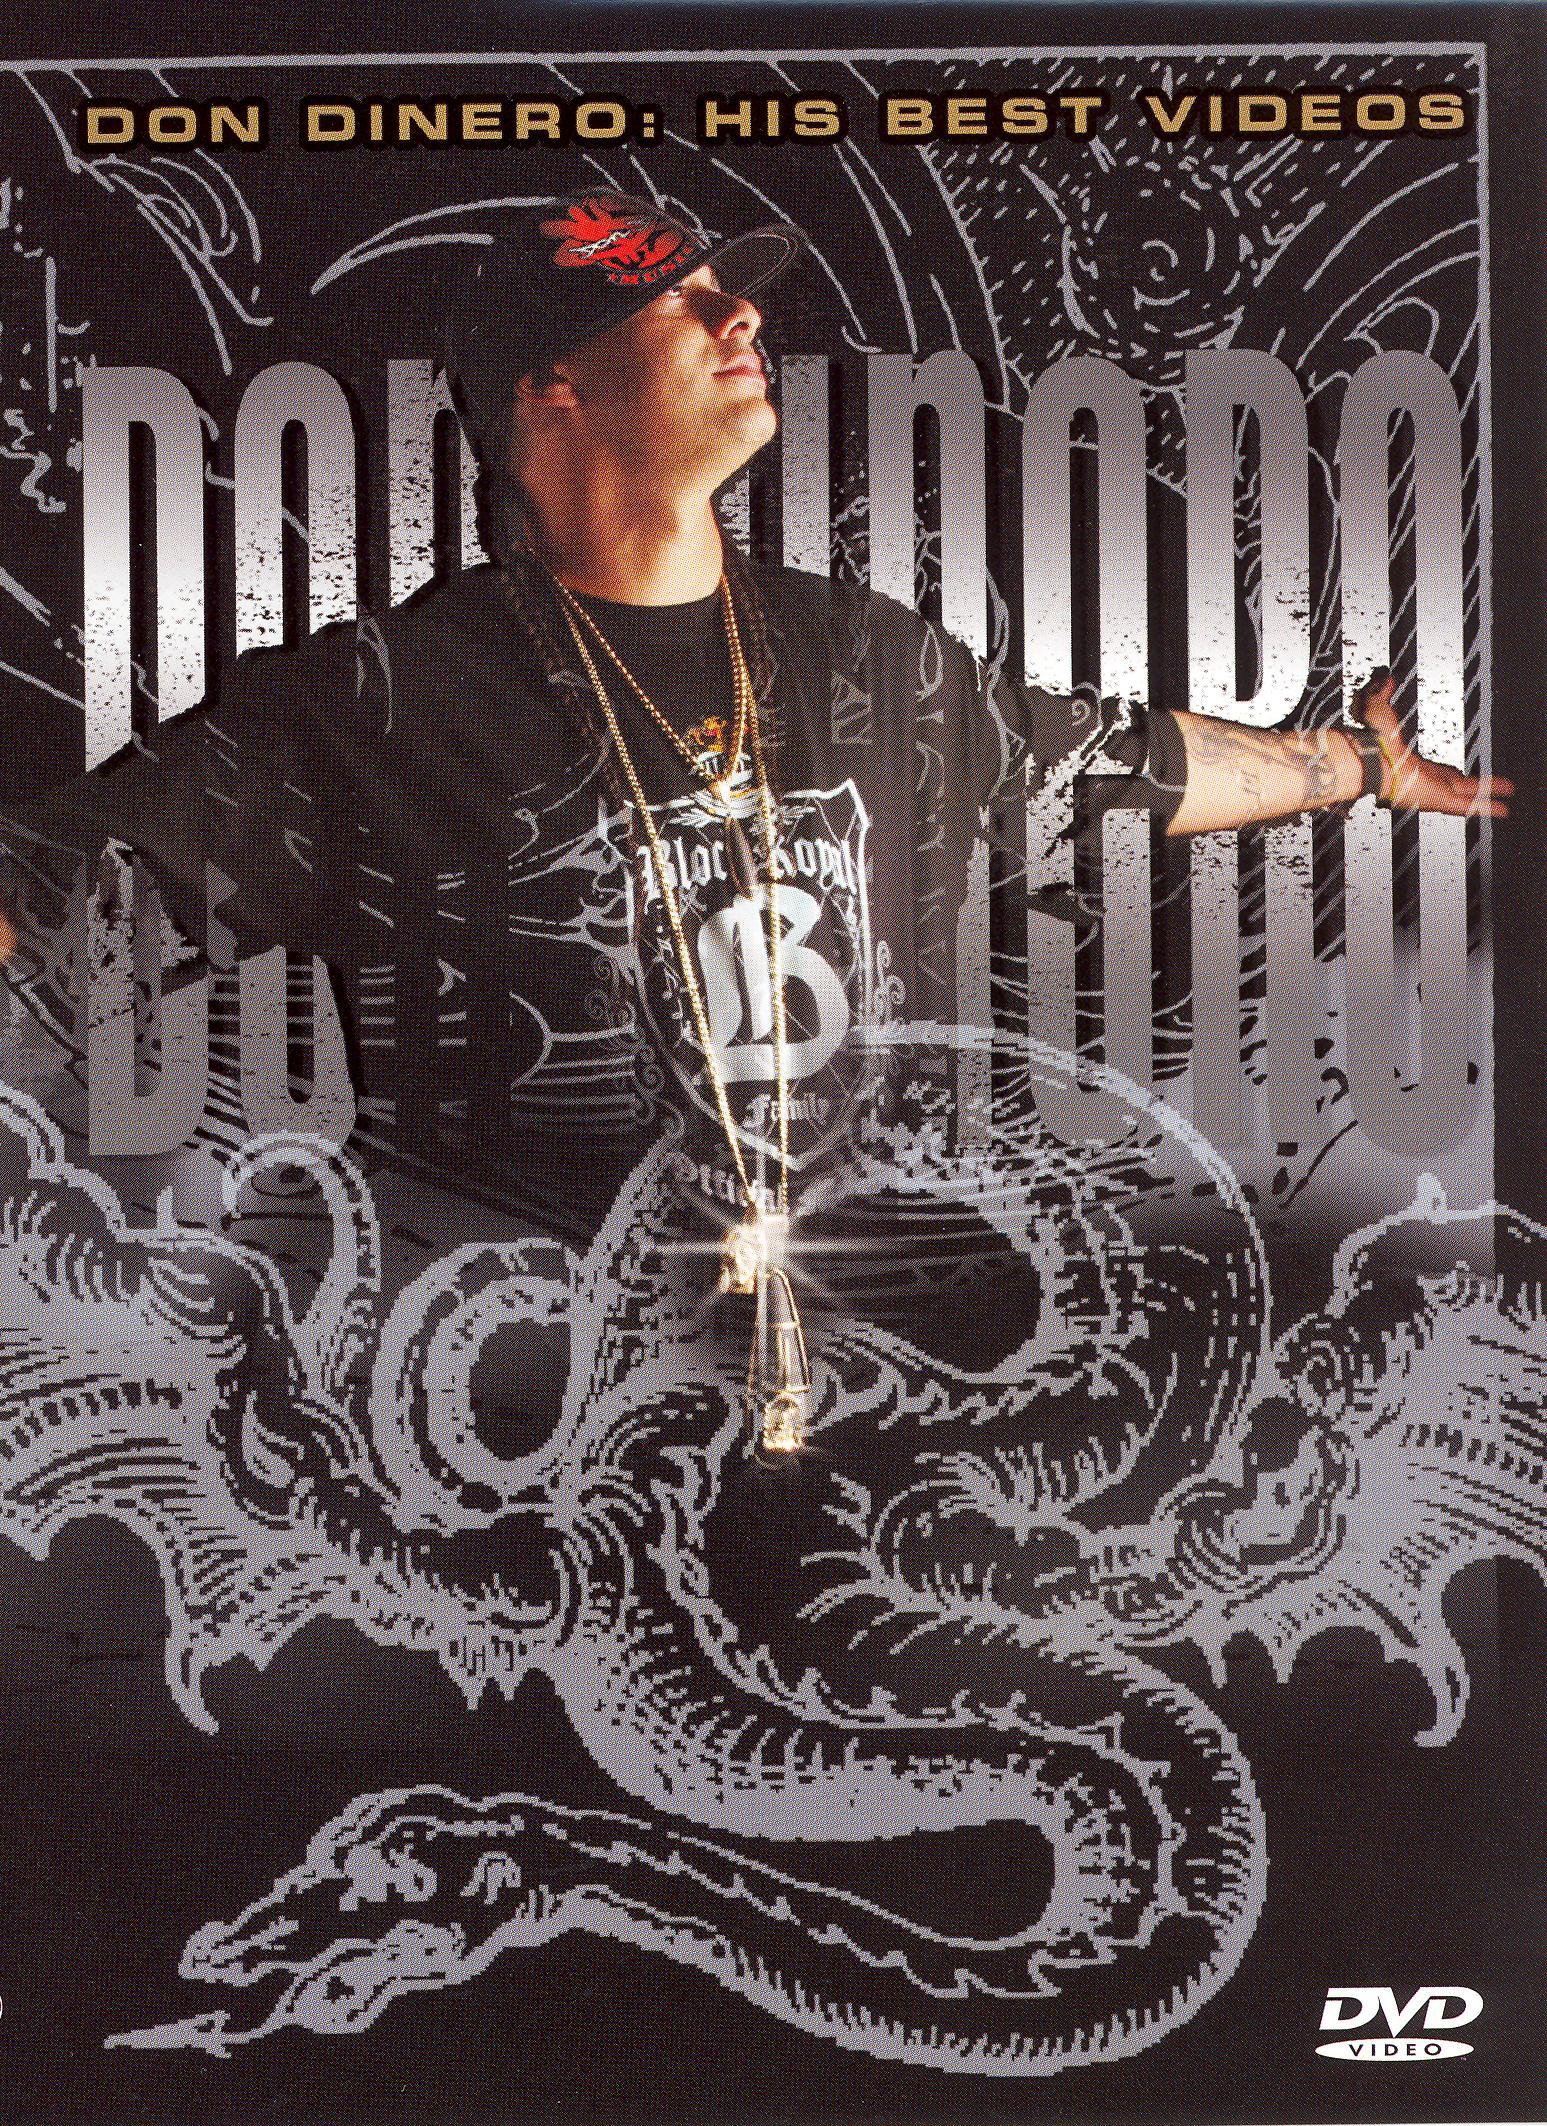 Don Dinero: Don Dinero Best Videos